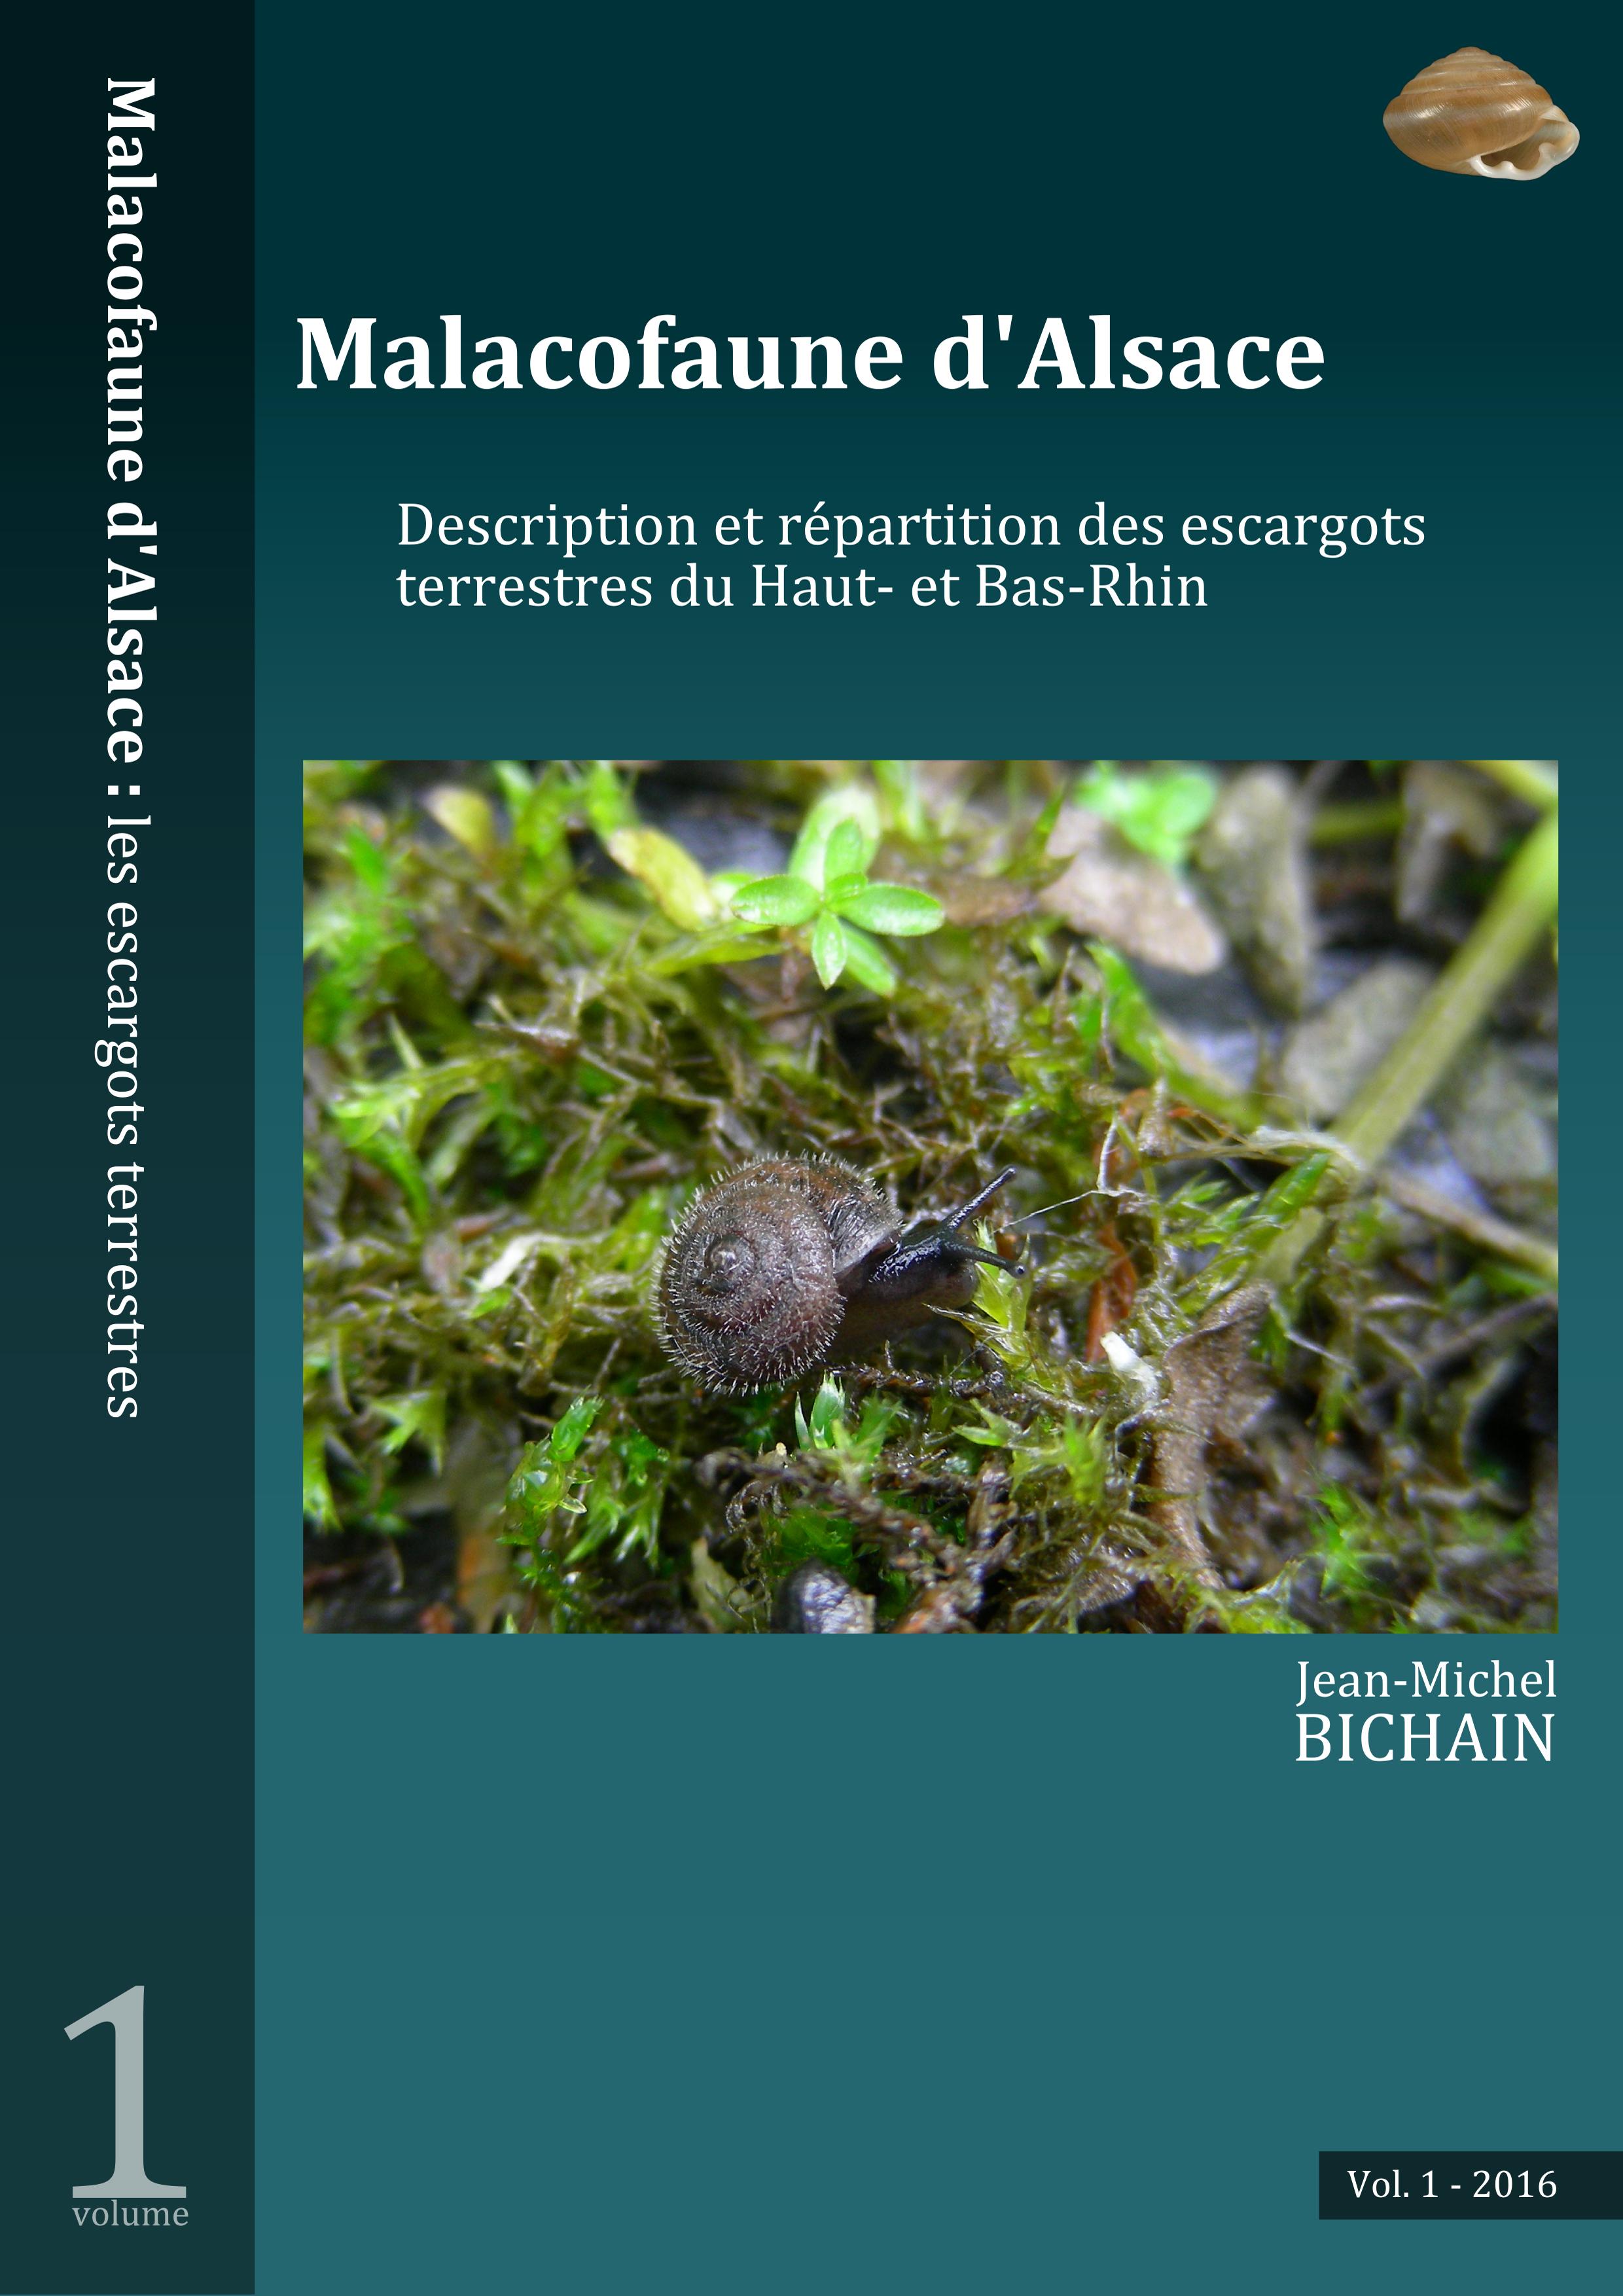 https://cdnfiles1.biolovision.net/www.faune-alsace.org/userfiles/mollusques/escargot2016.jpg